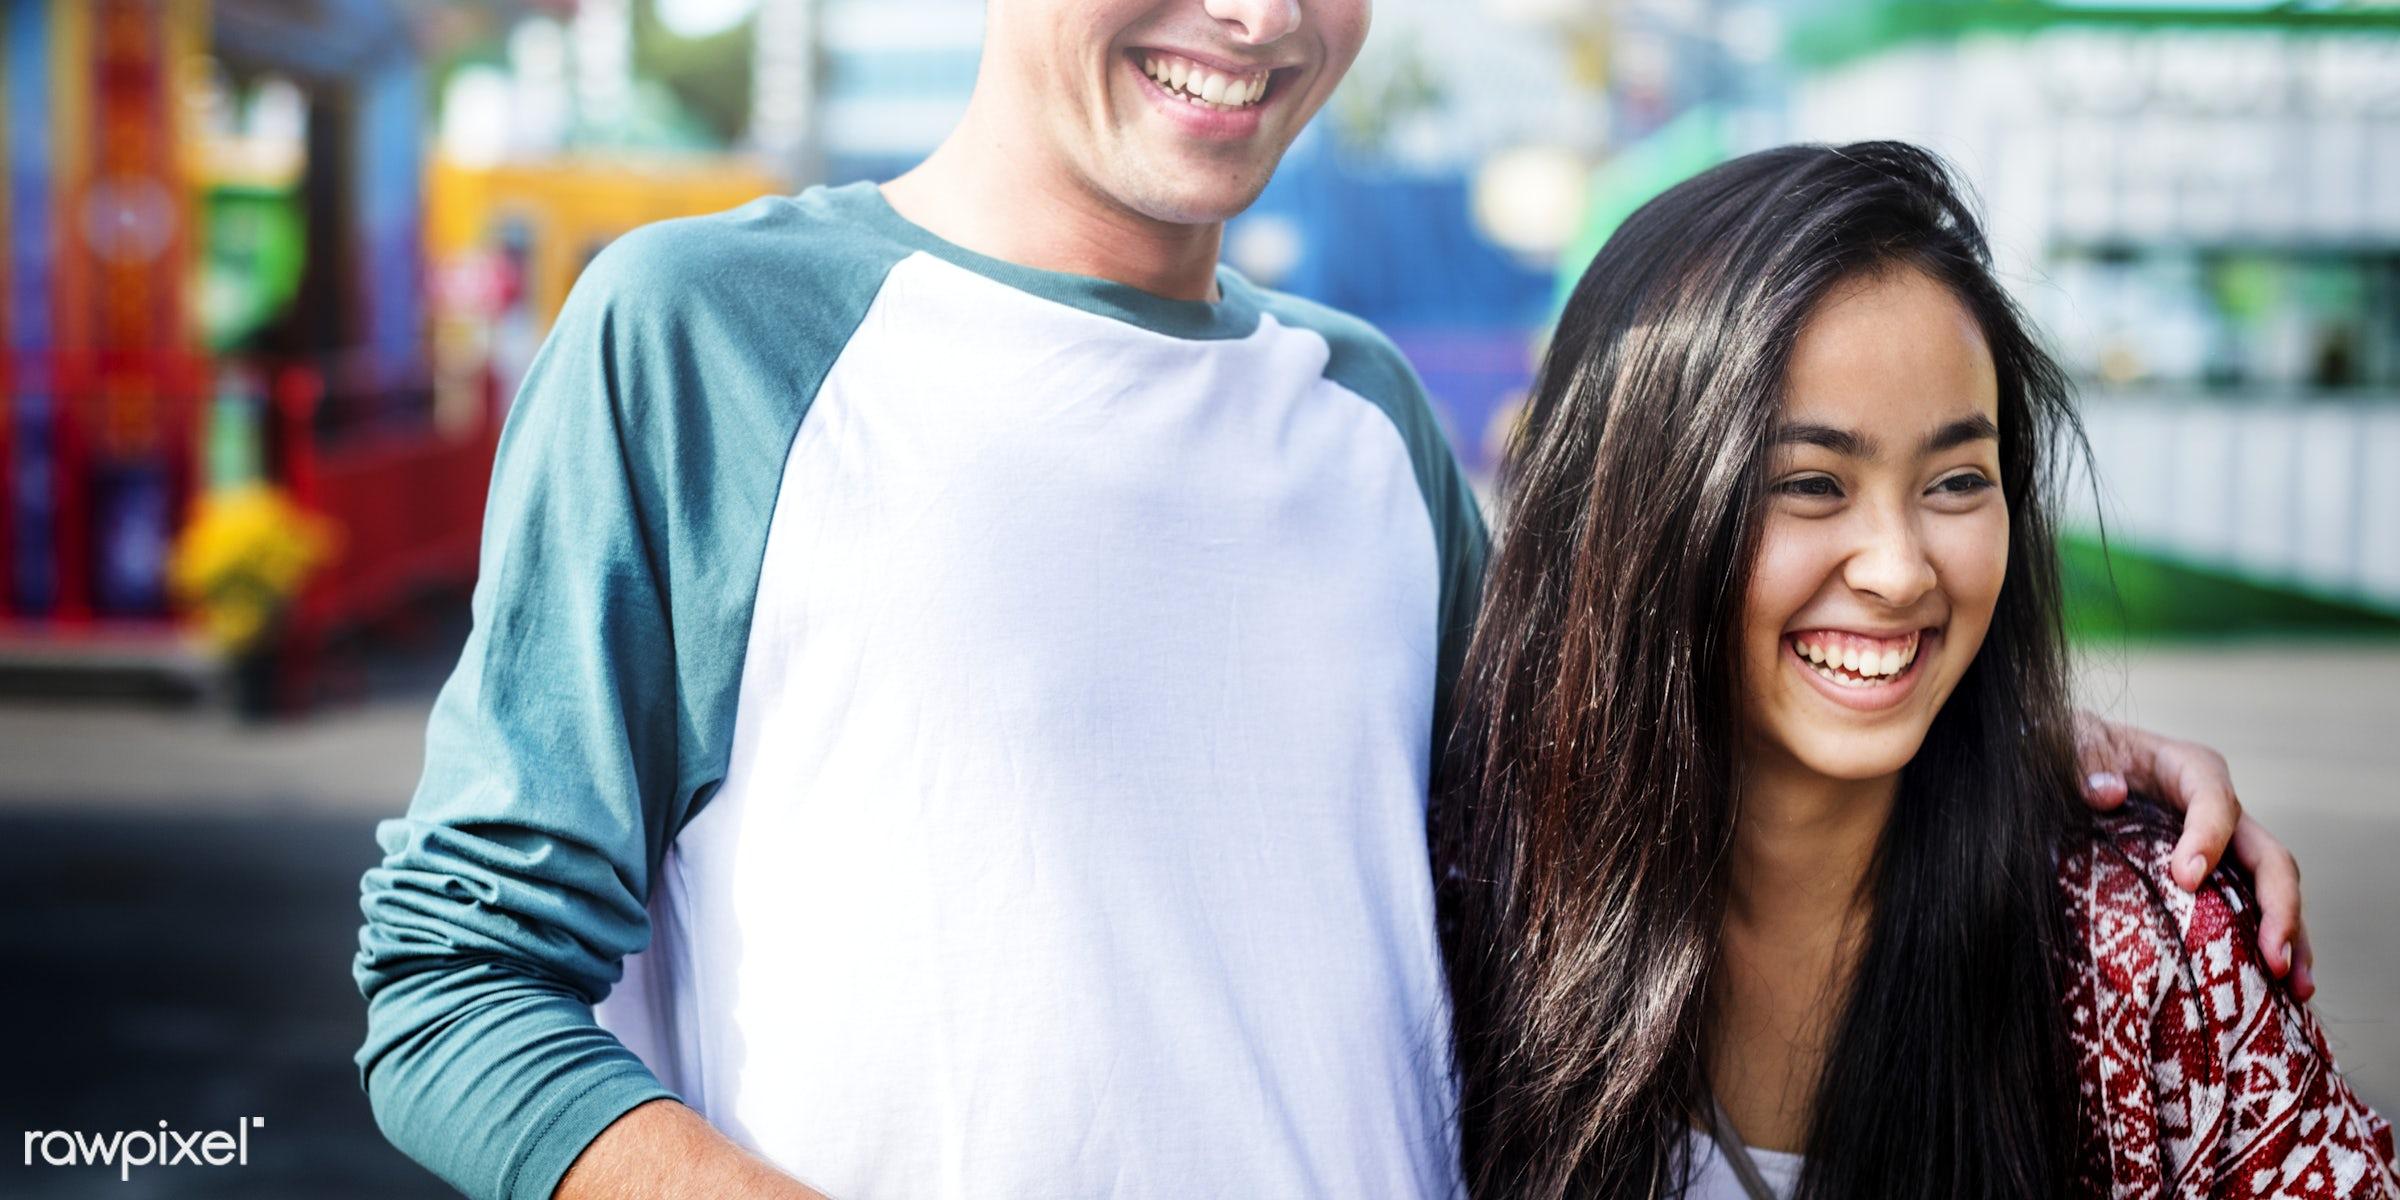 adorable, affectionate, amusement, amusement park, asian, beautiful, black hair, boyfriend, bright, candid, care, carnival,...